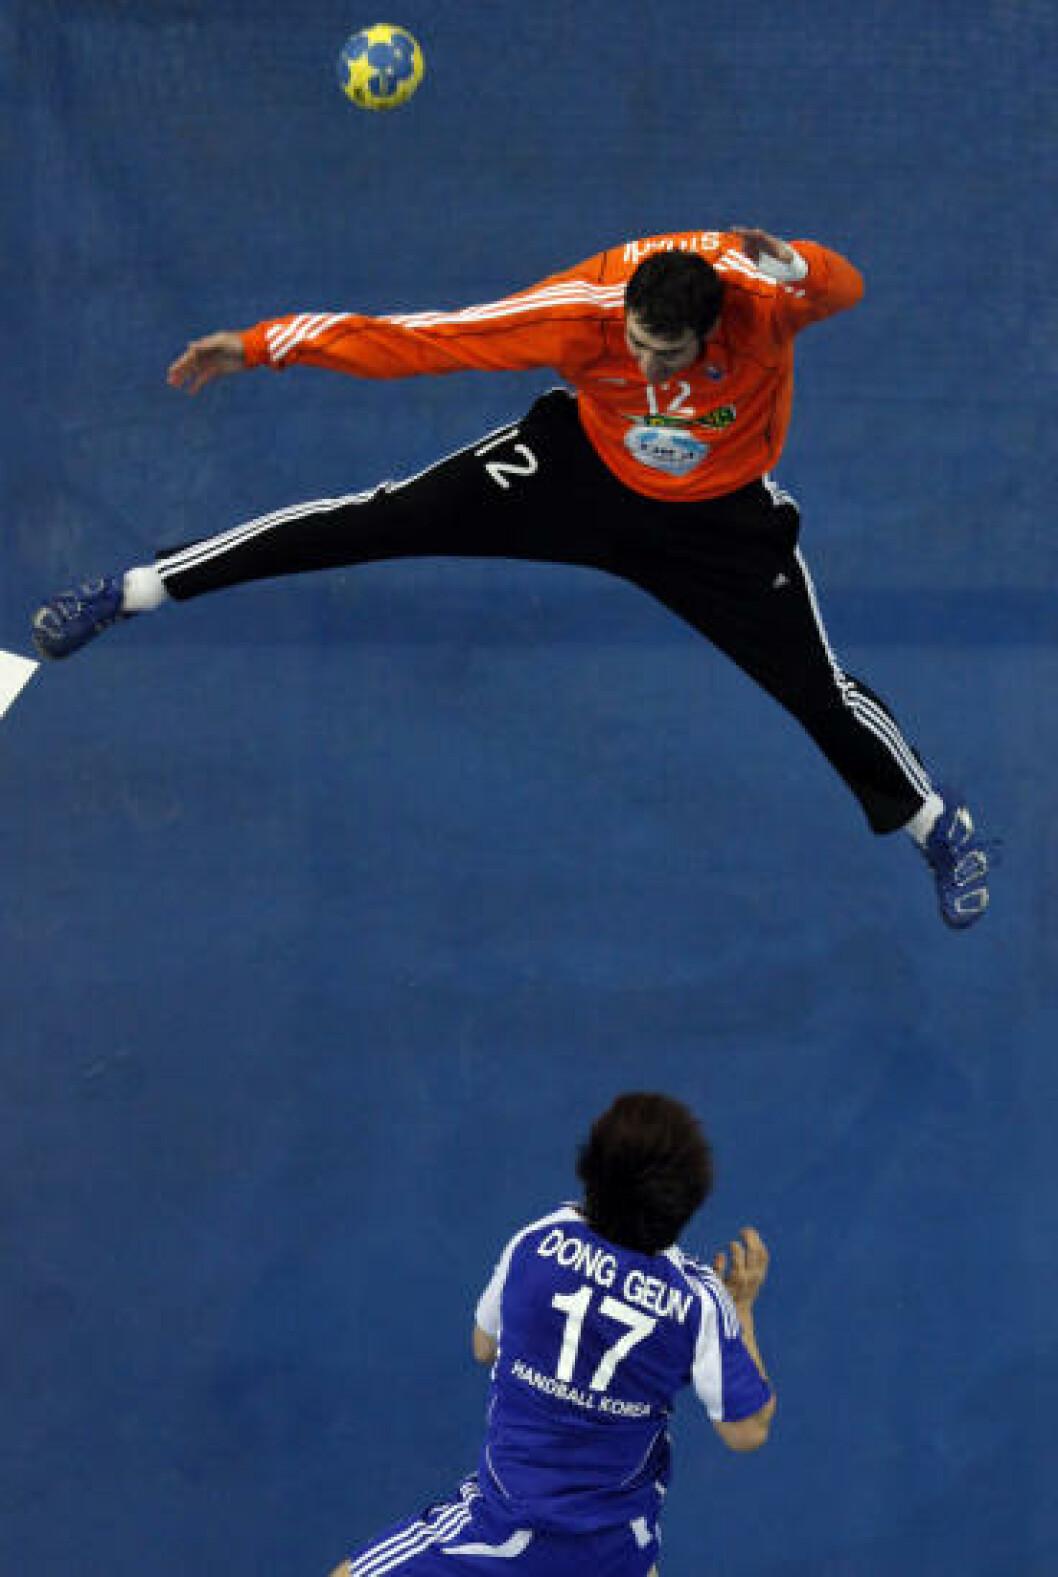 Koreas Yu Dong Geun scorer mot Slovakia. Foto: REUTERS/Umit Bektas